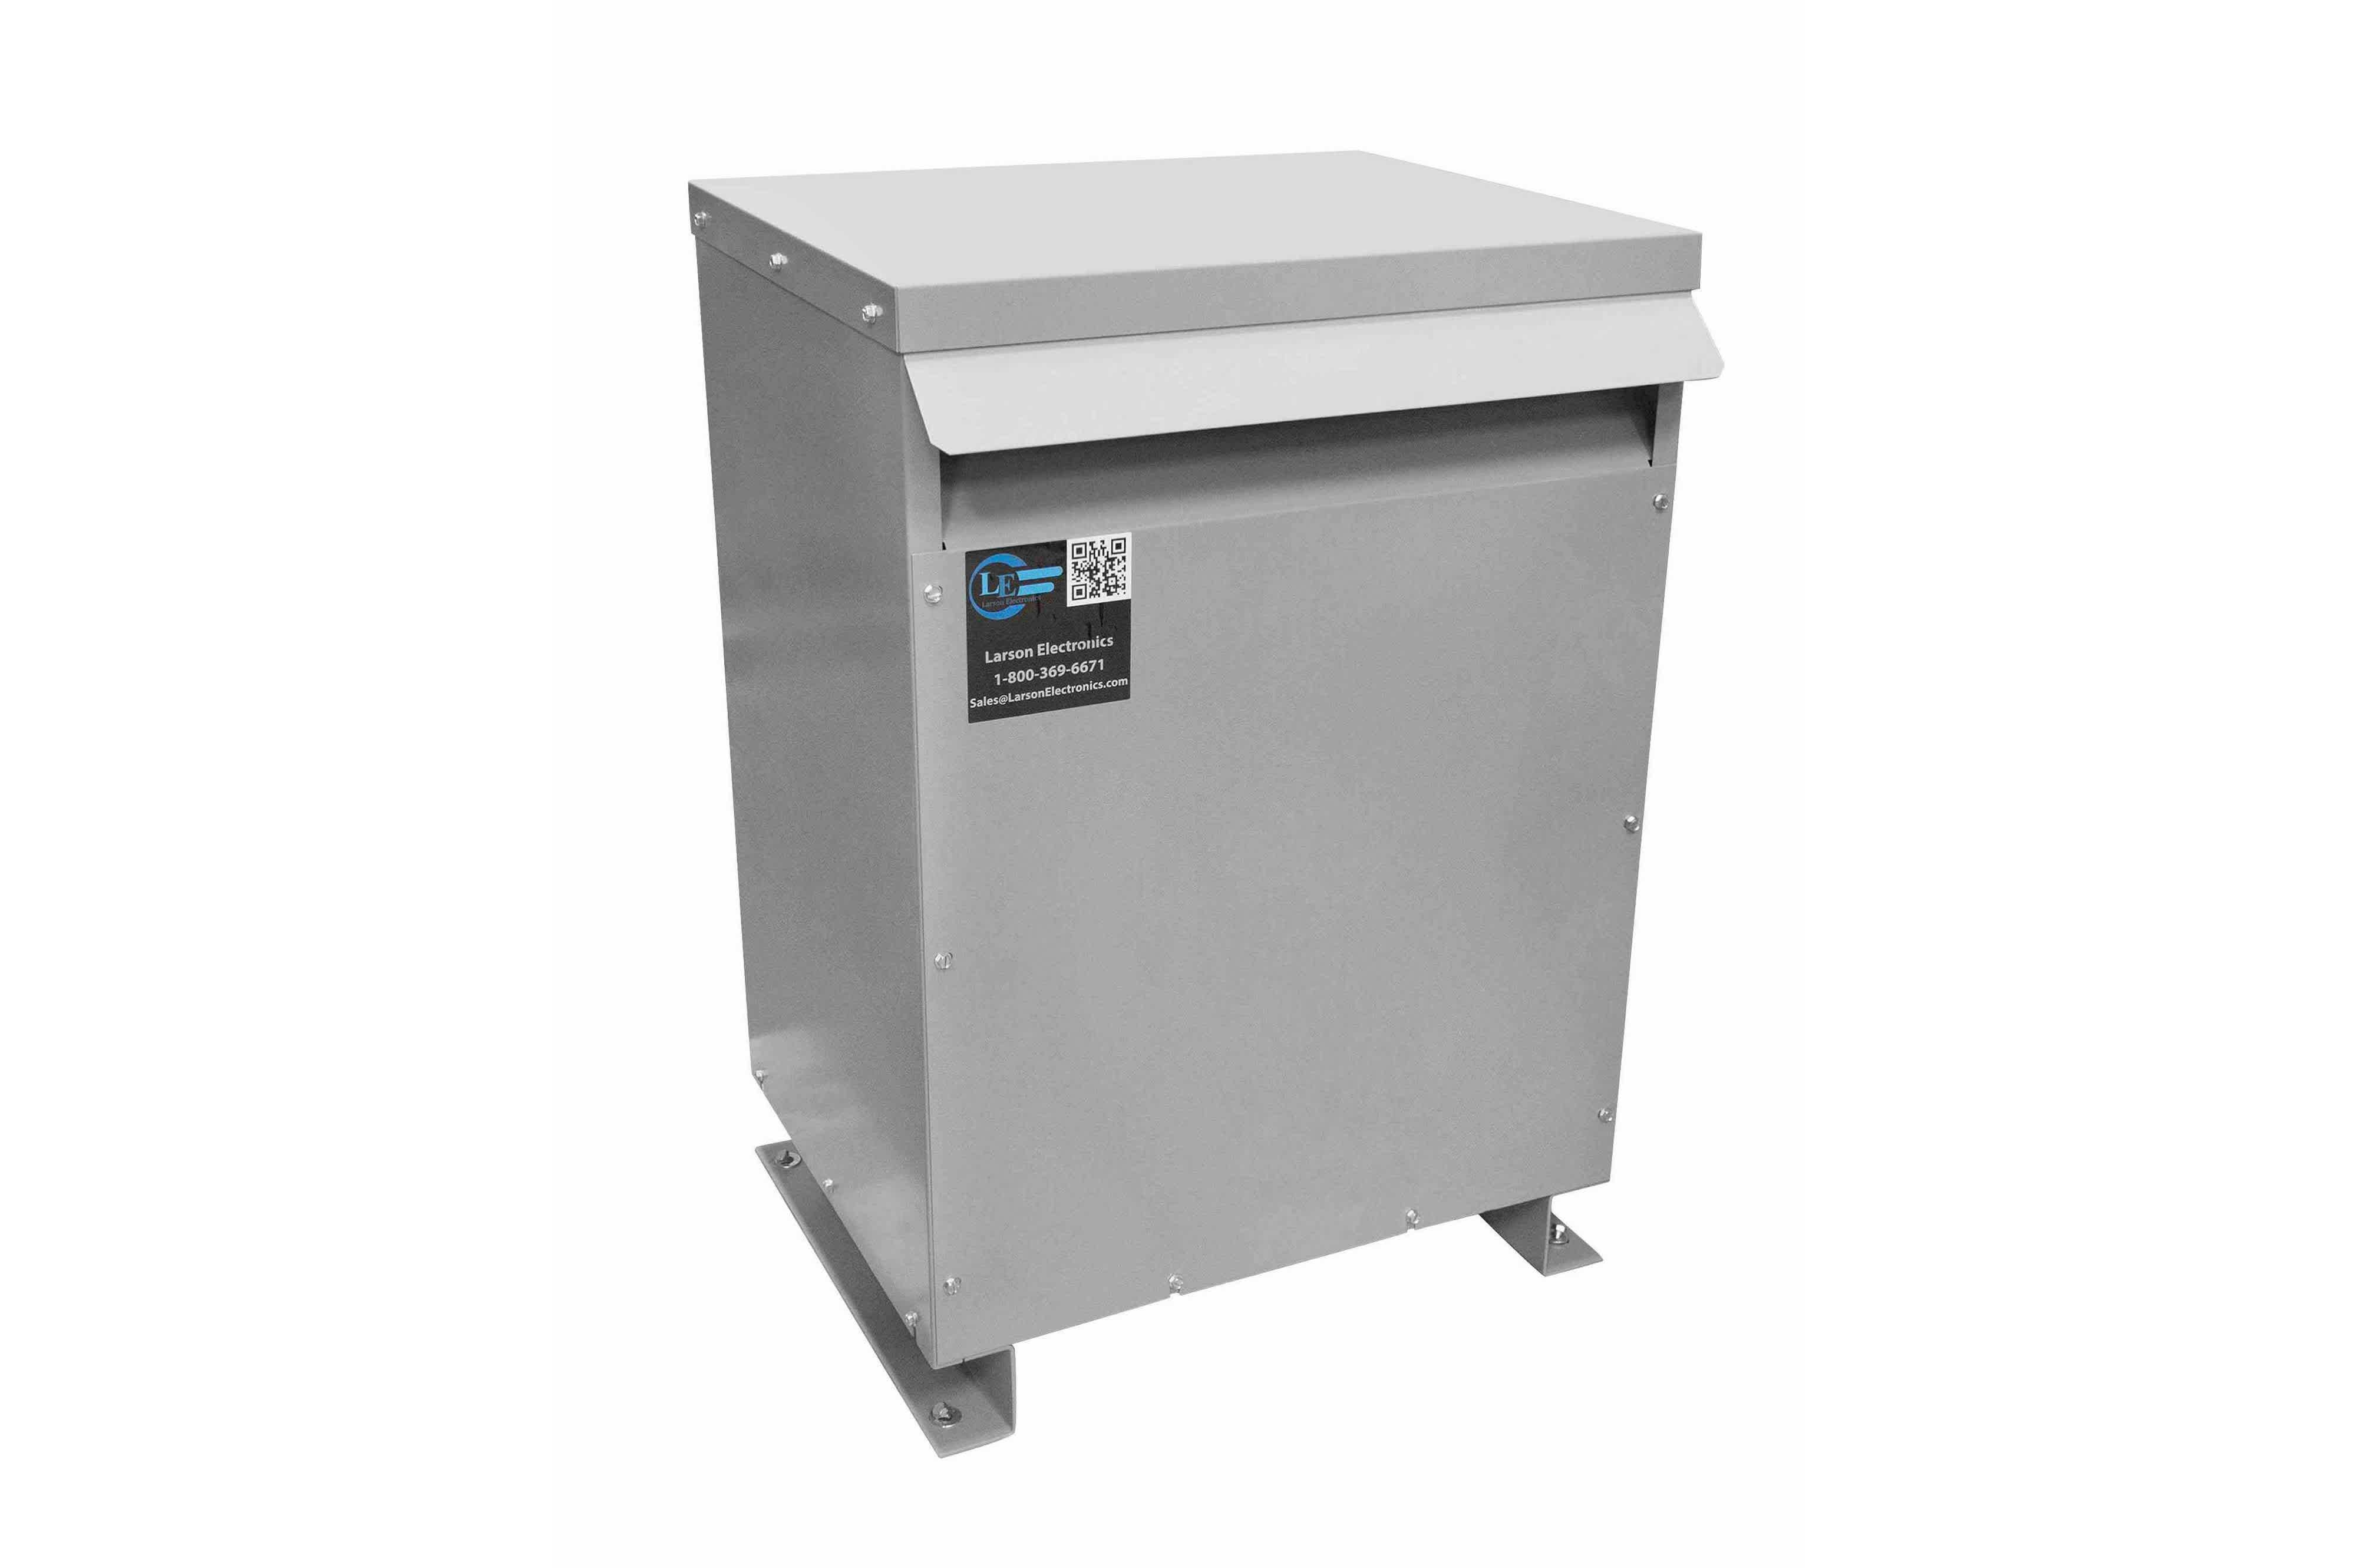 36 kVA 3PH Isolation Transformer, 240V Wye Primary, 480V Delta Secondary, N3R, Ventilated, 60 Hz